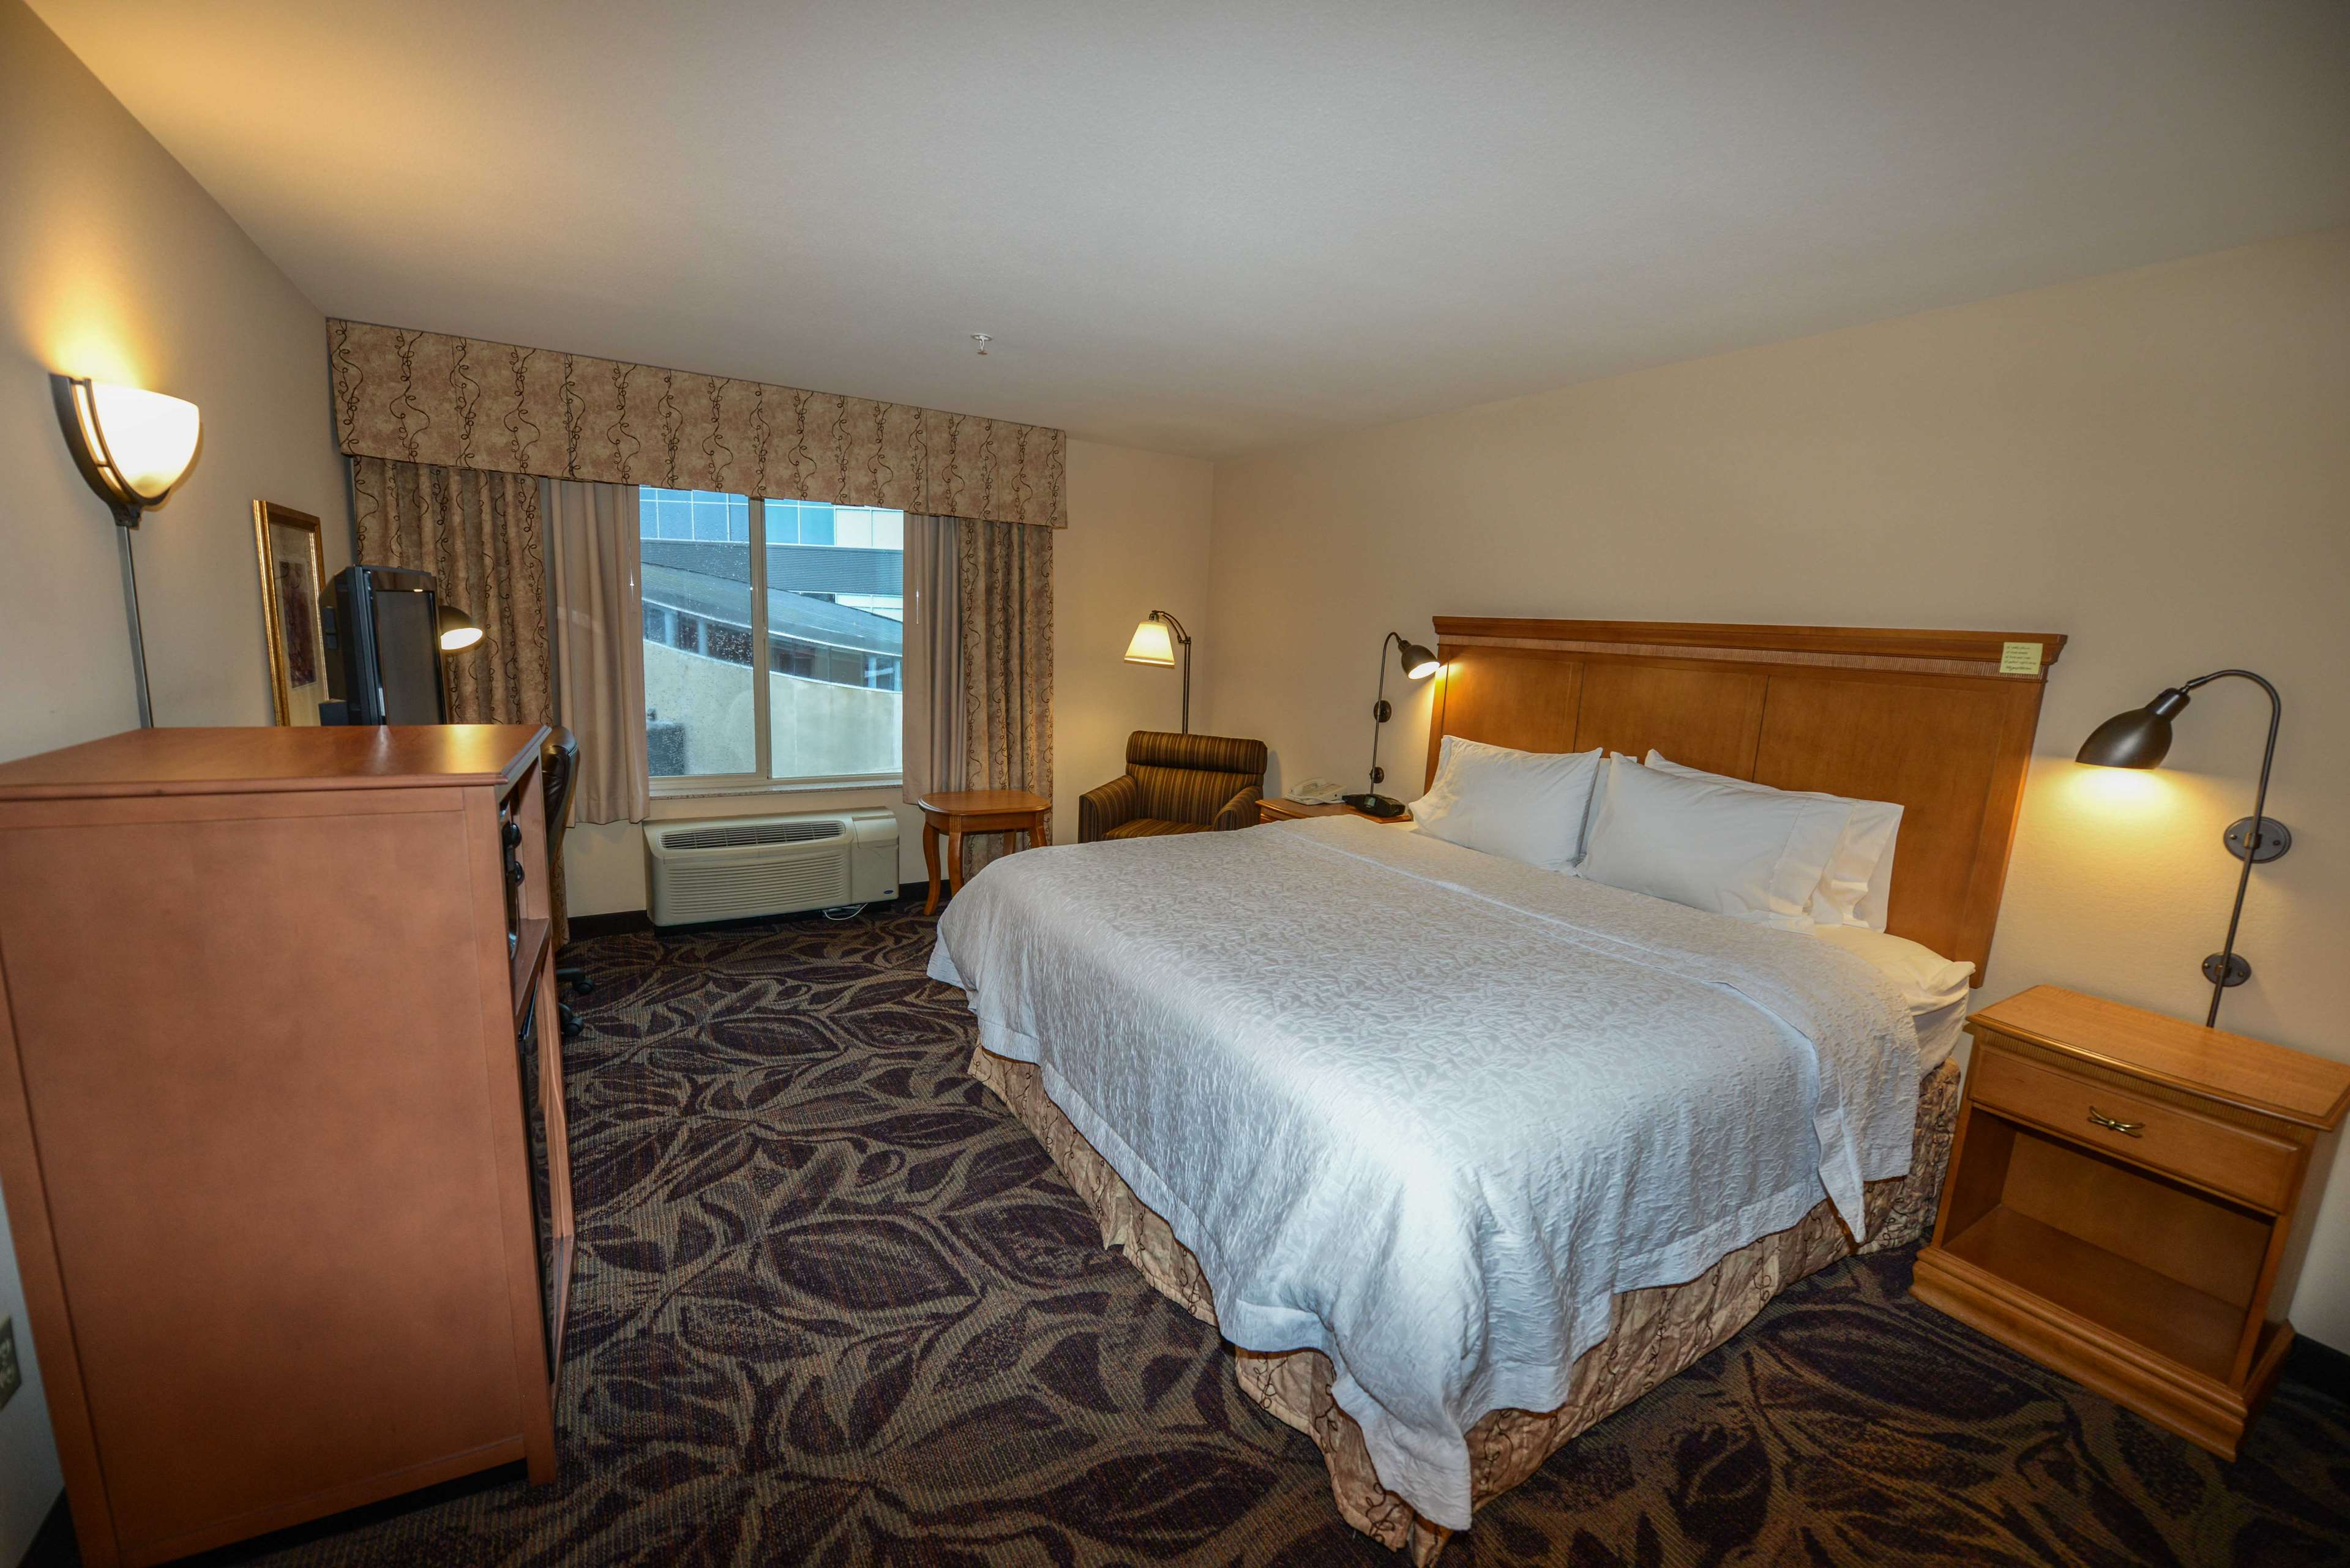 Hampton Inn & Suites Bremerton image 33